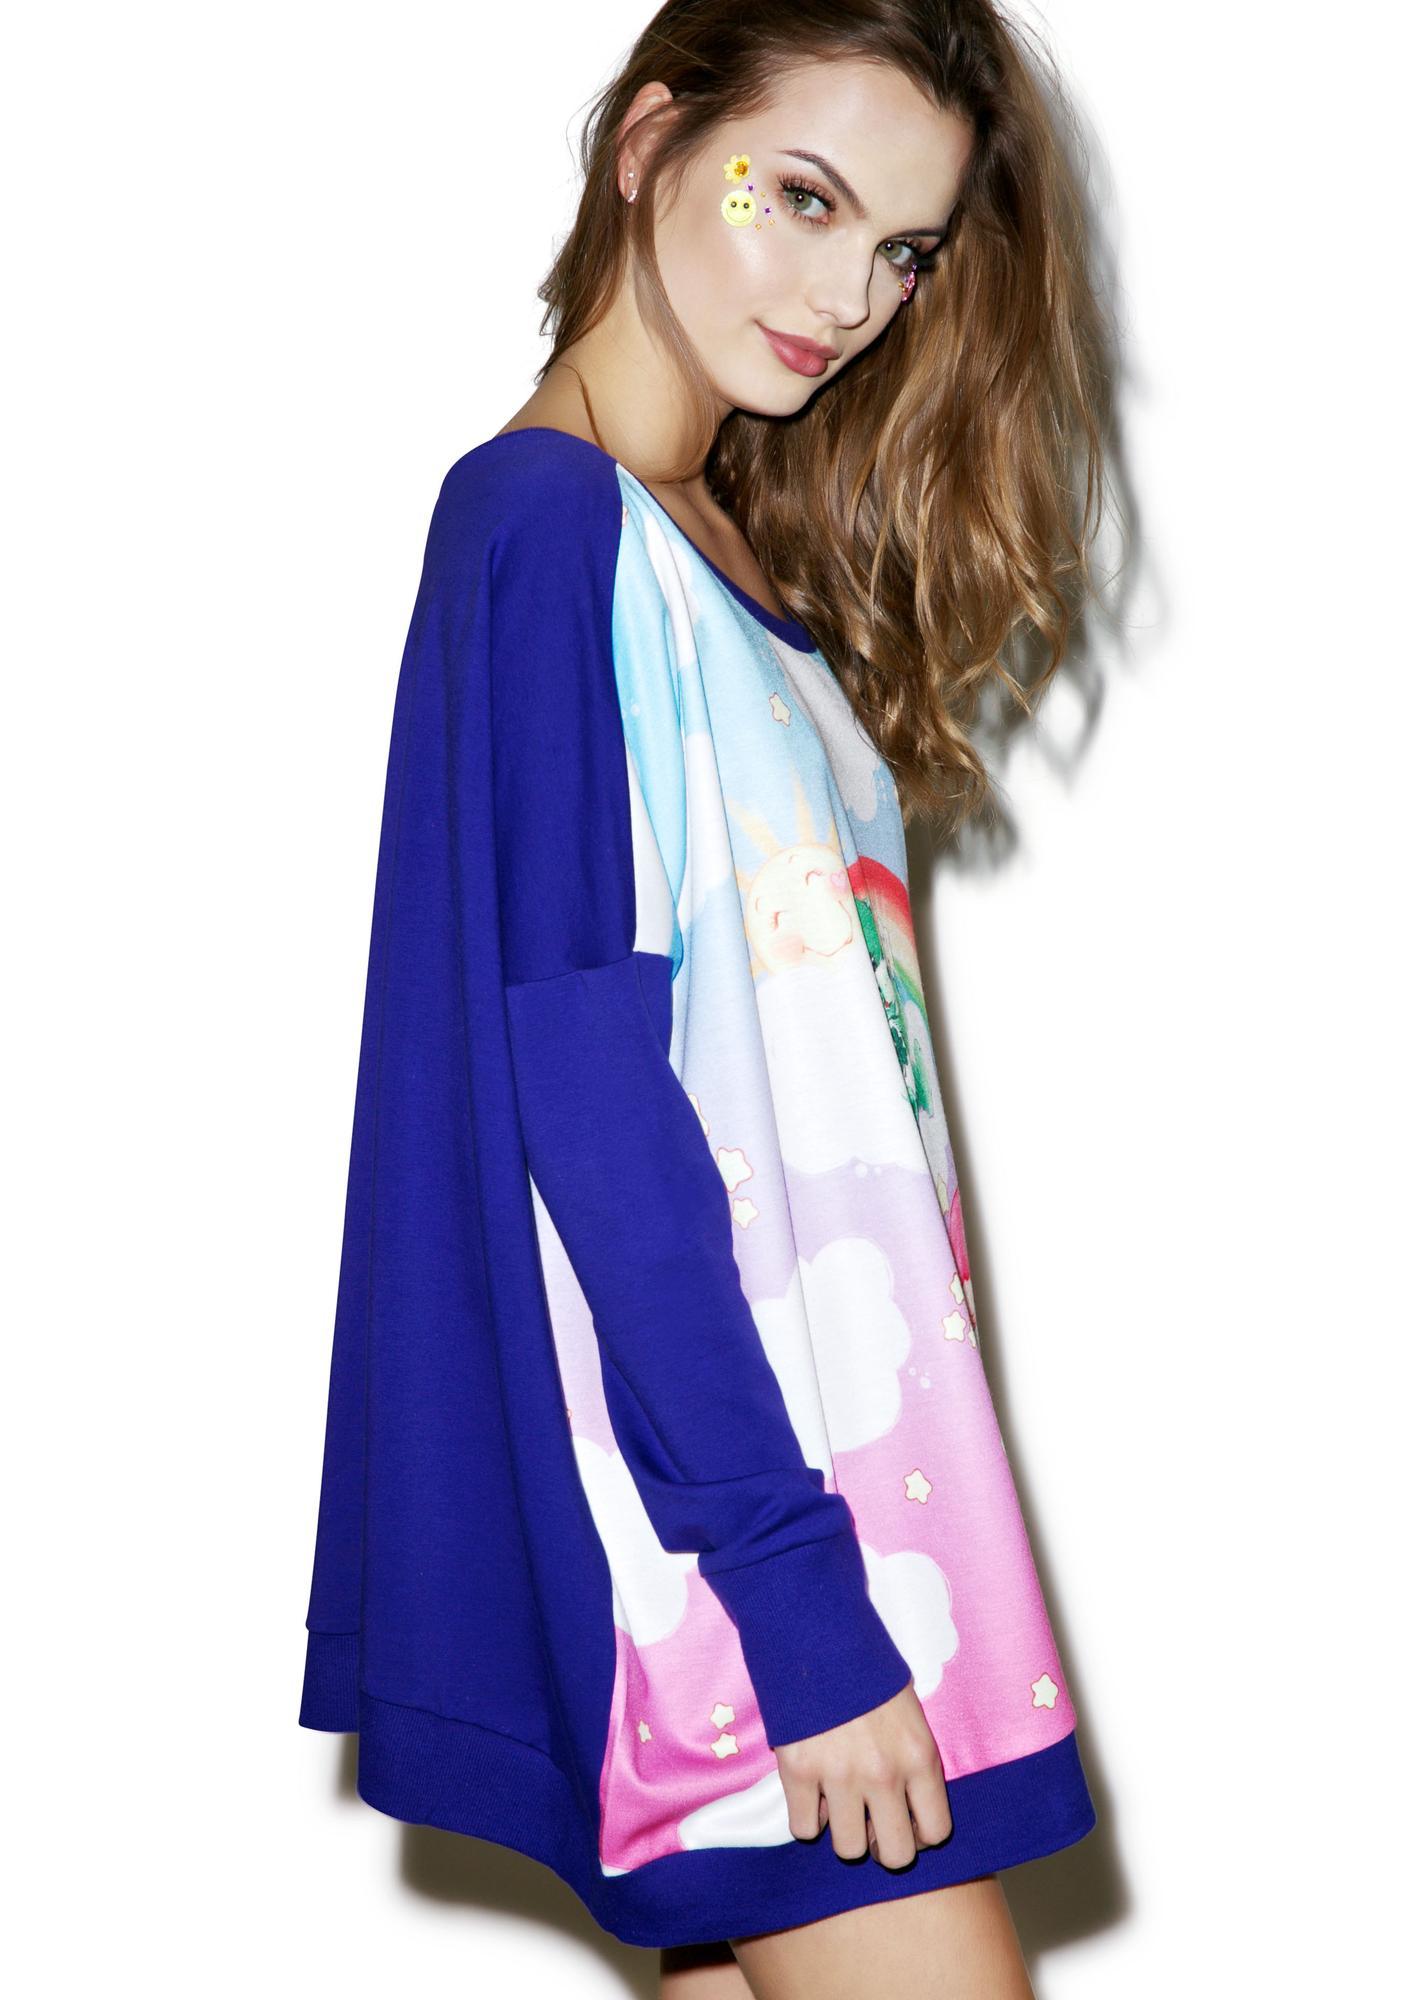 Japan L.A. Little Twin Stars X Care Bears Poncho Sweatshirt